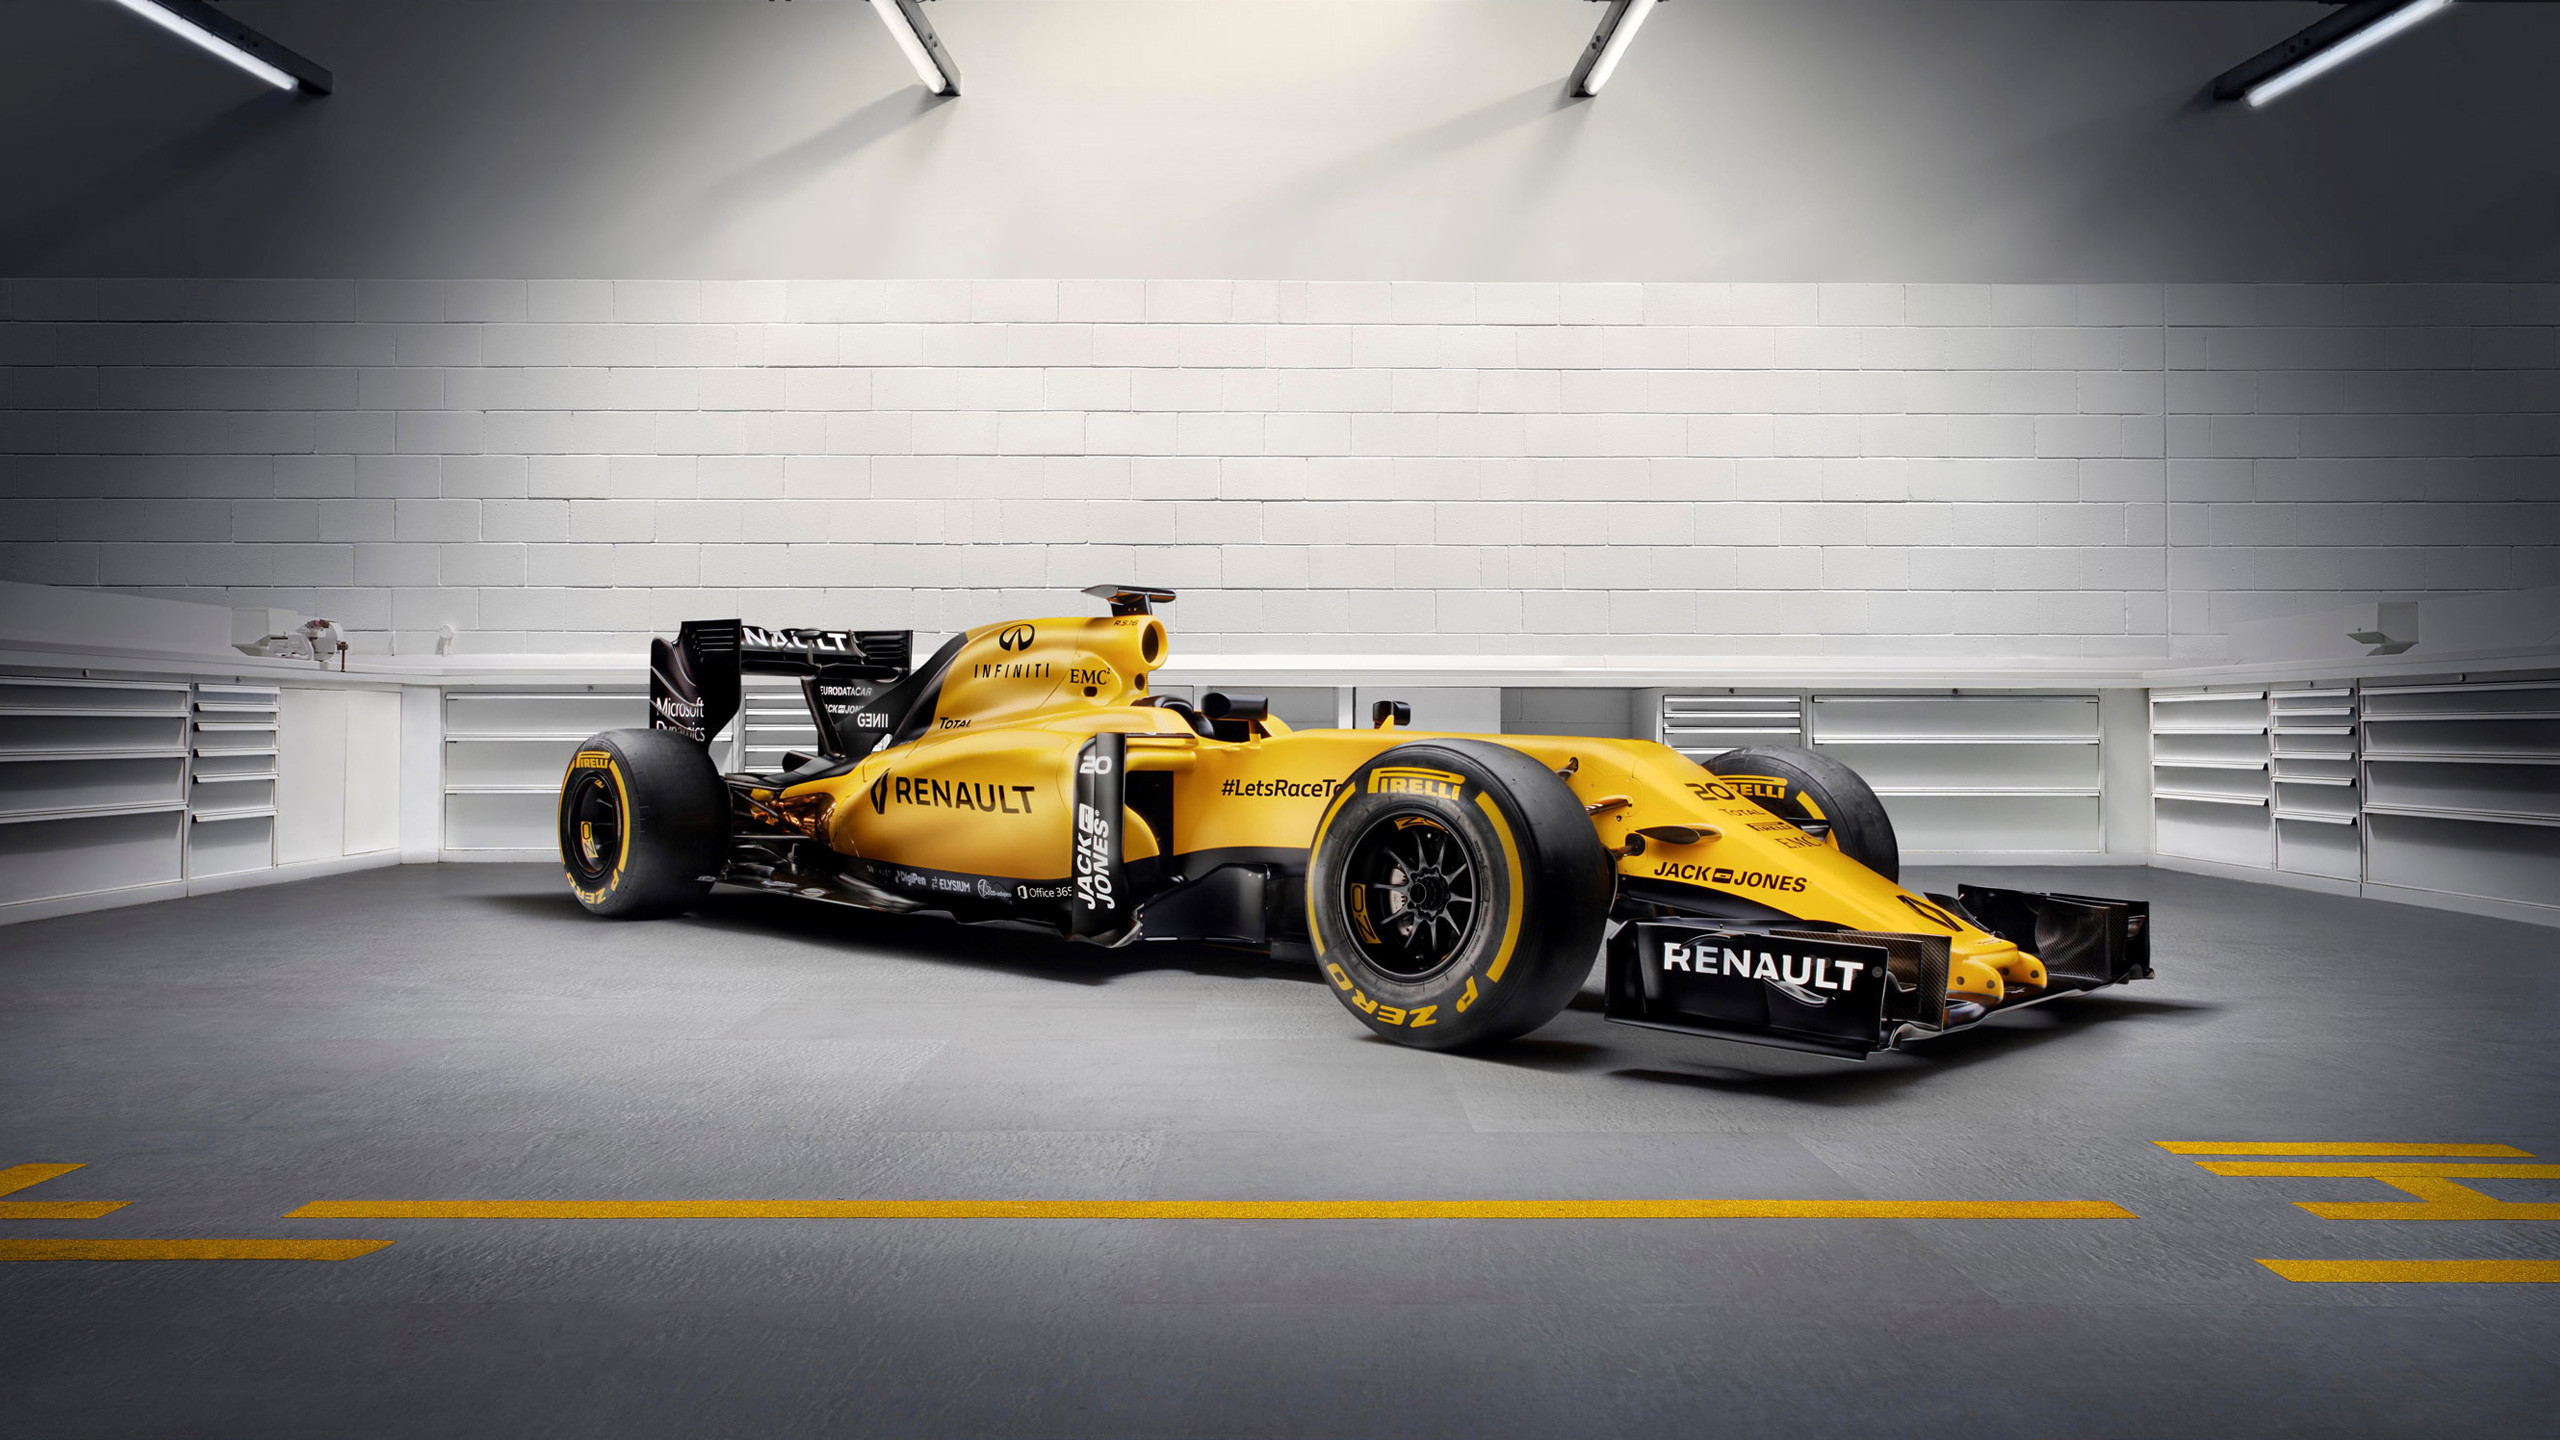 2016 Renault RS16 Formula 1